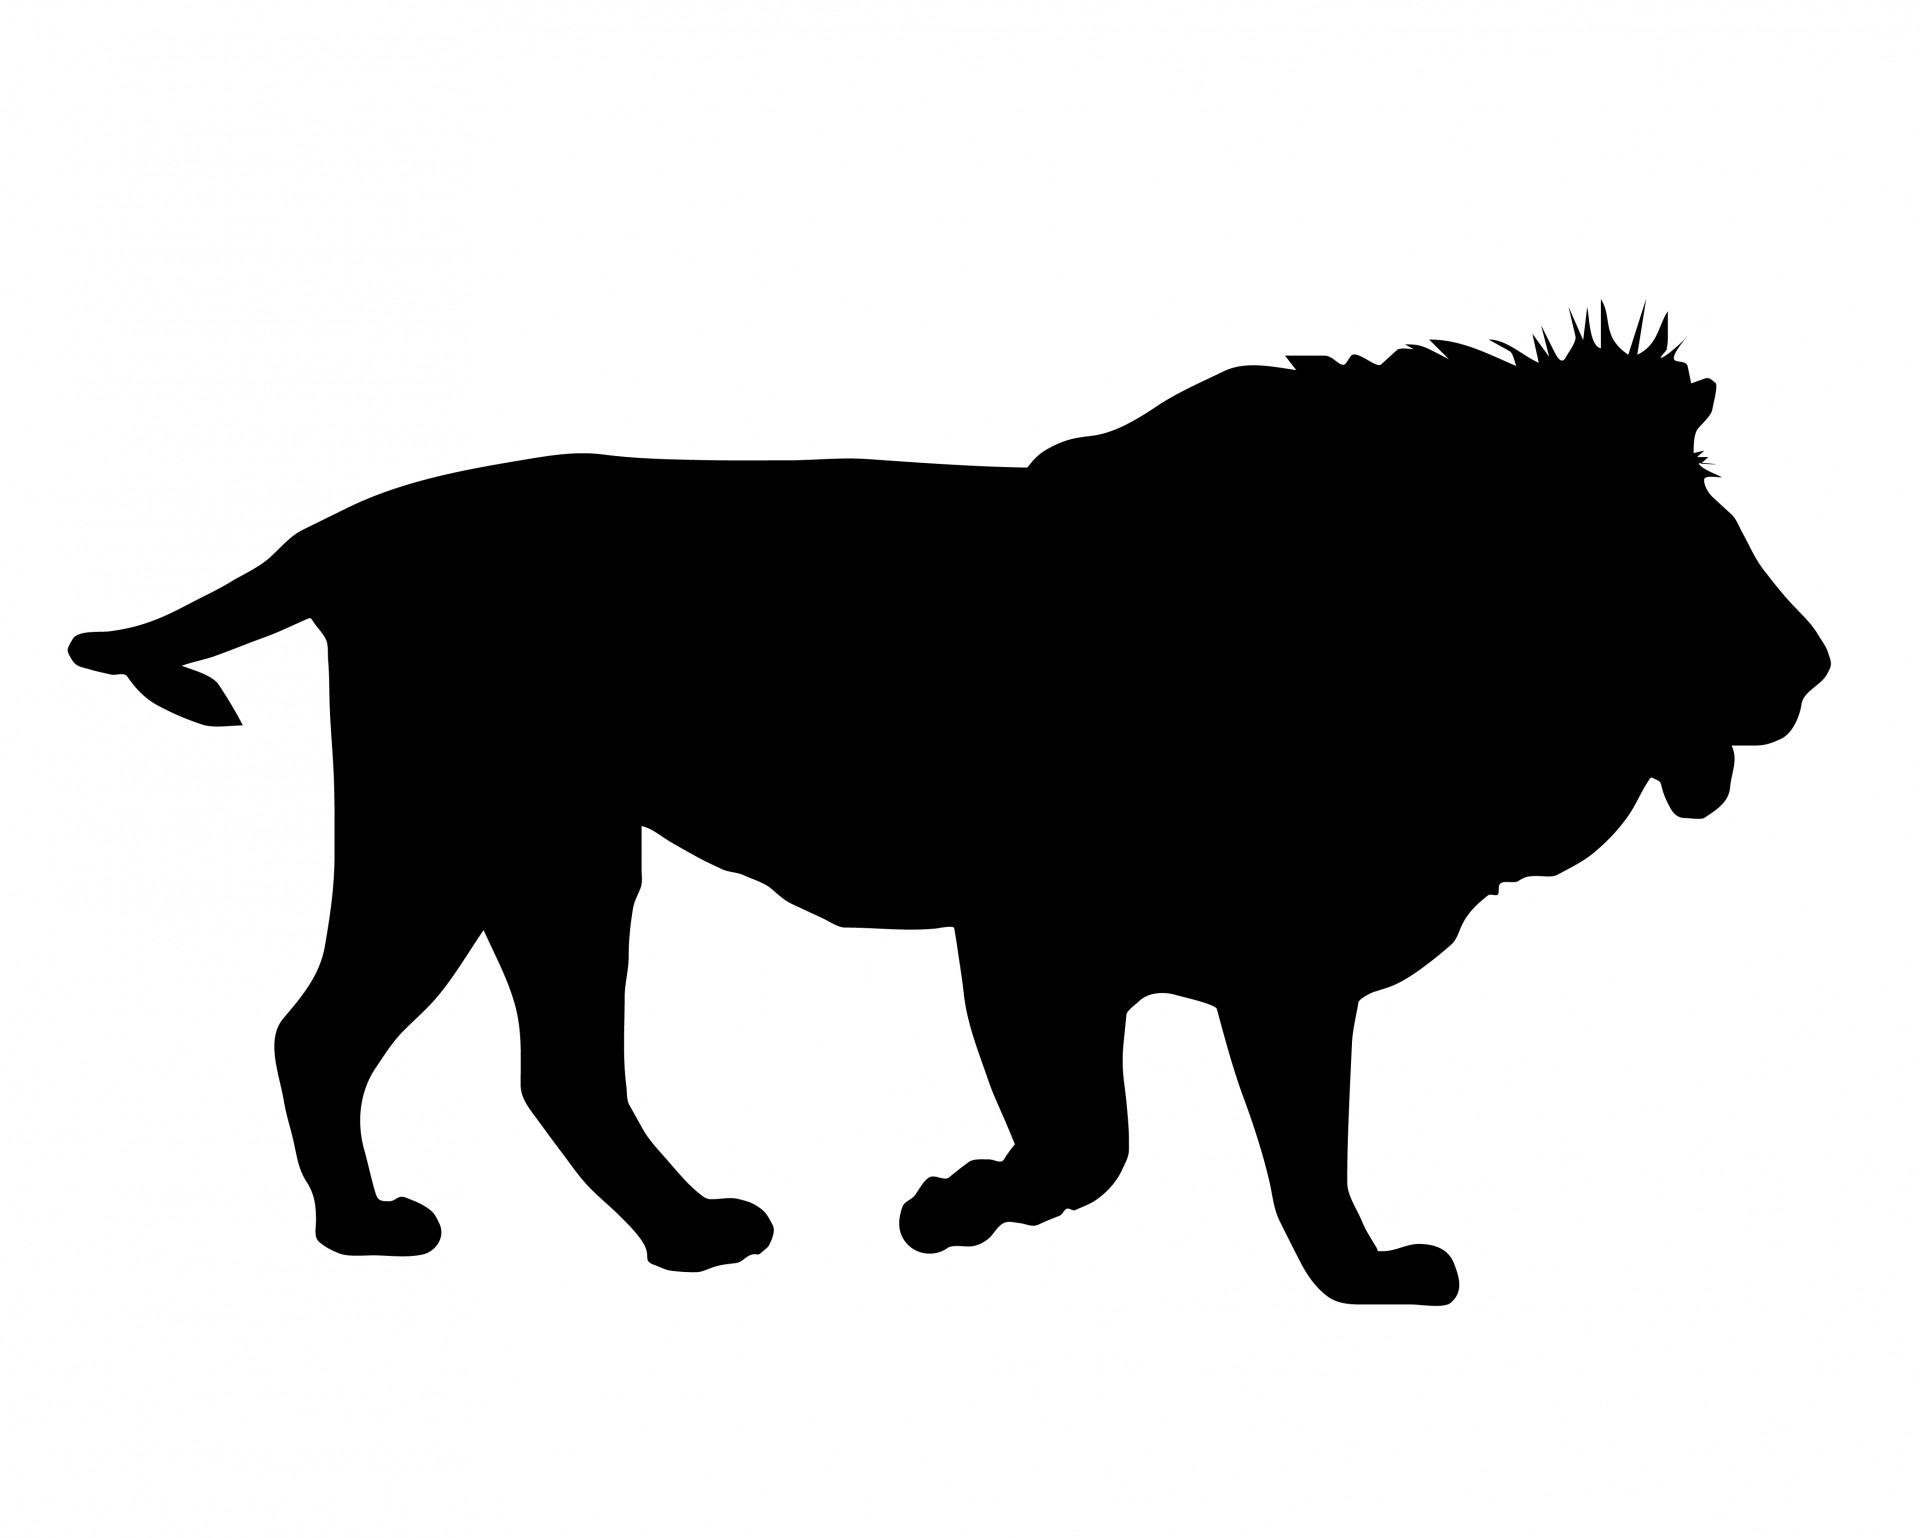 Black lion clipart jpg royalty free stock Black lion silhouette clipart free image jpg royalty free stock